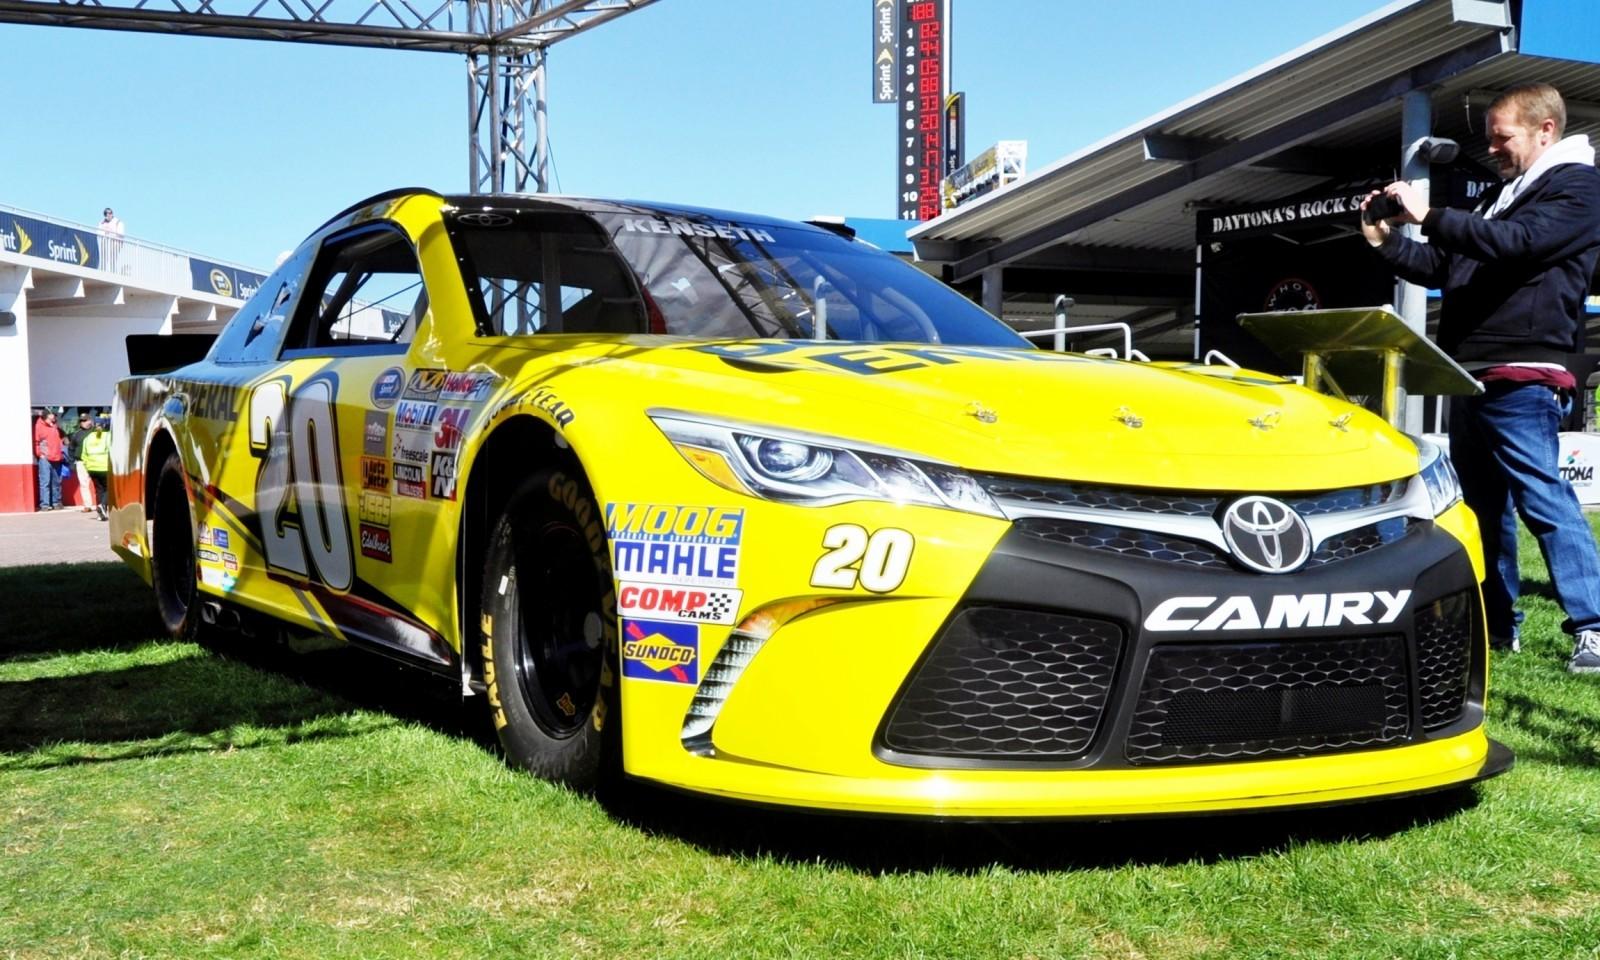 2015 Toyota Camry NASCAR Dollar General 16